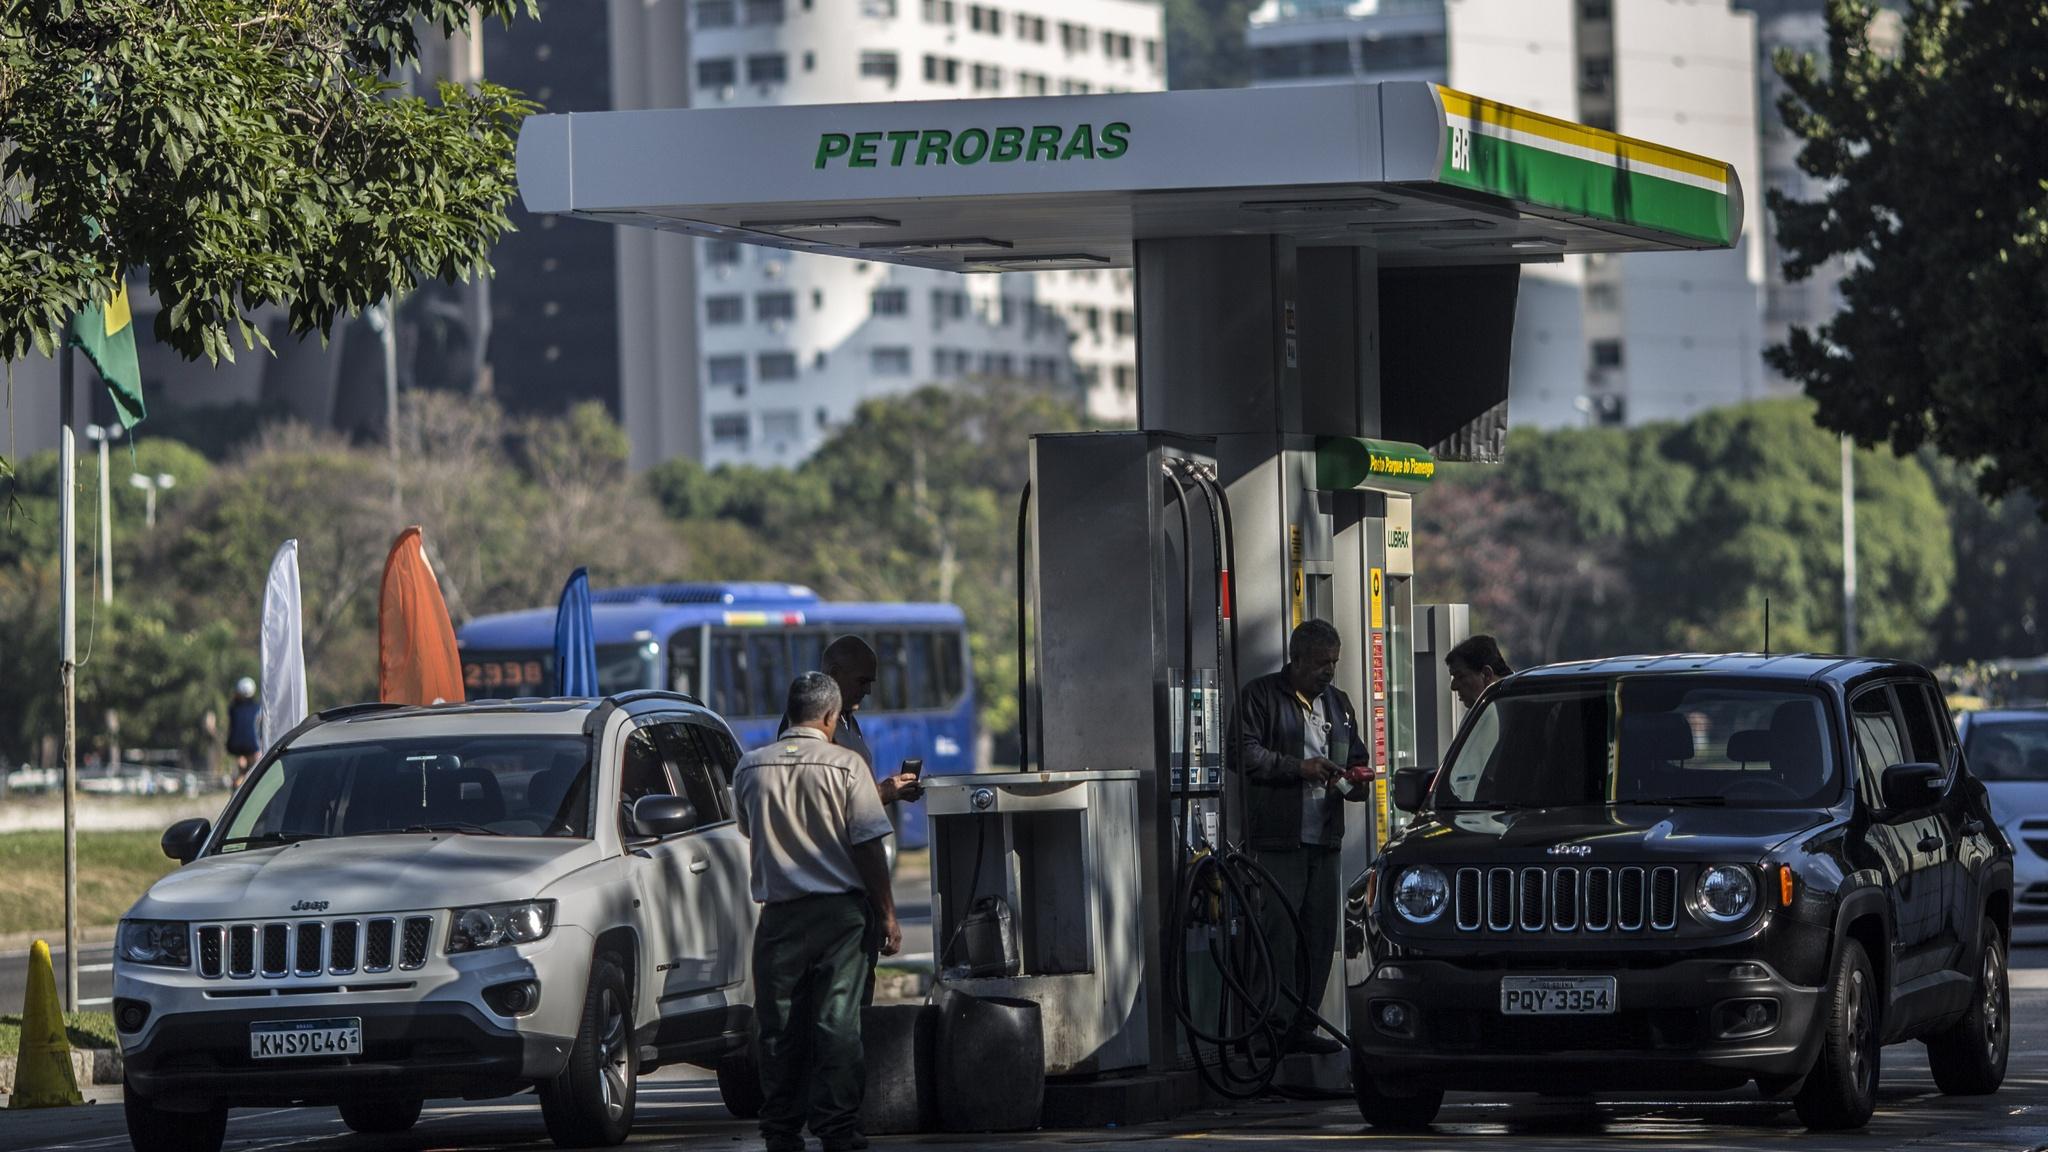 Brazil's Petrobras sees jump in second quarter profits